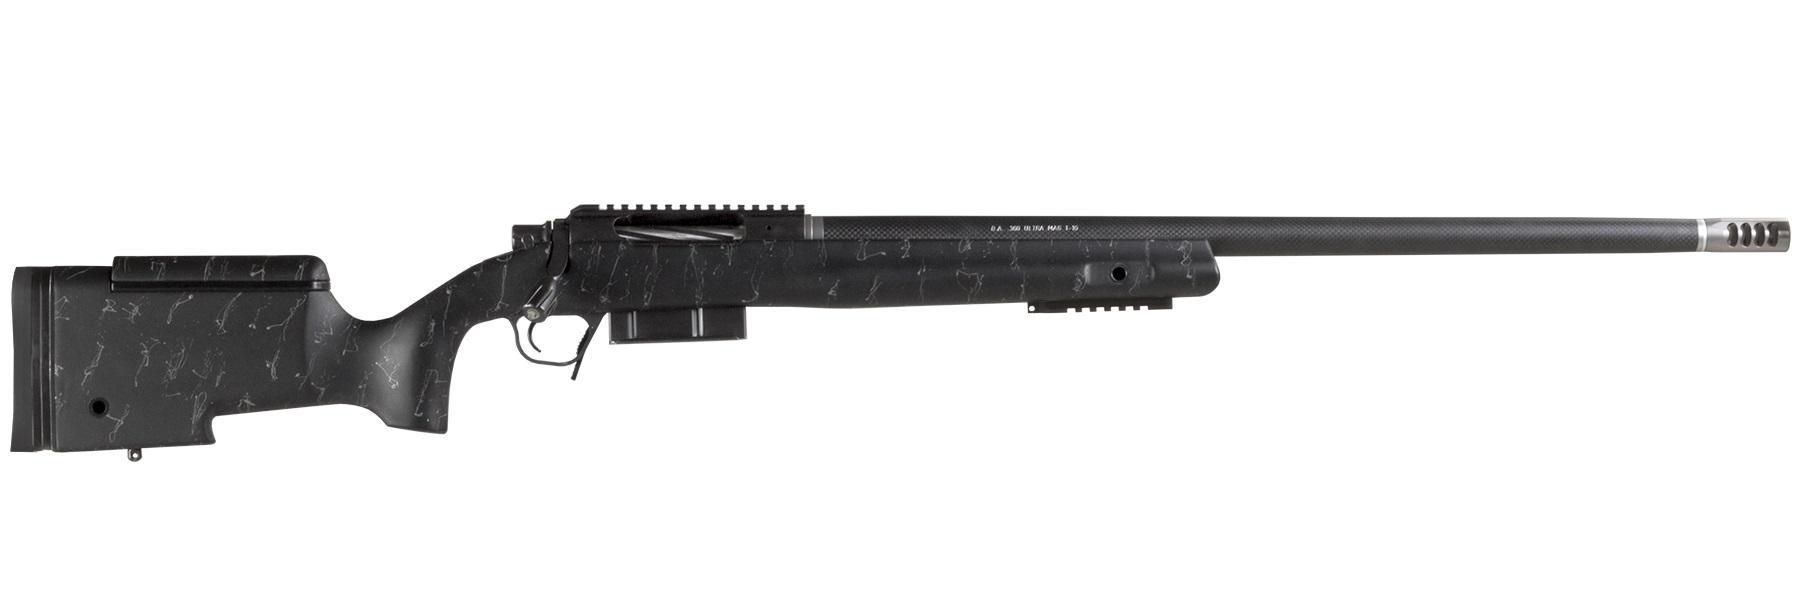 BA TAC 338LAP BLK/GRY 27 TB - 801-04003-00